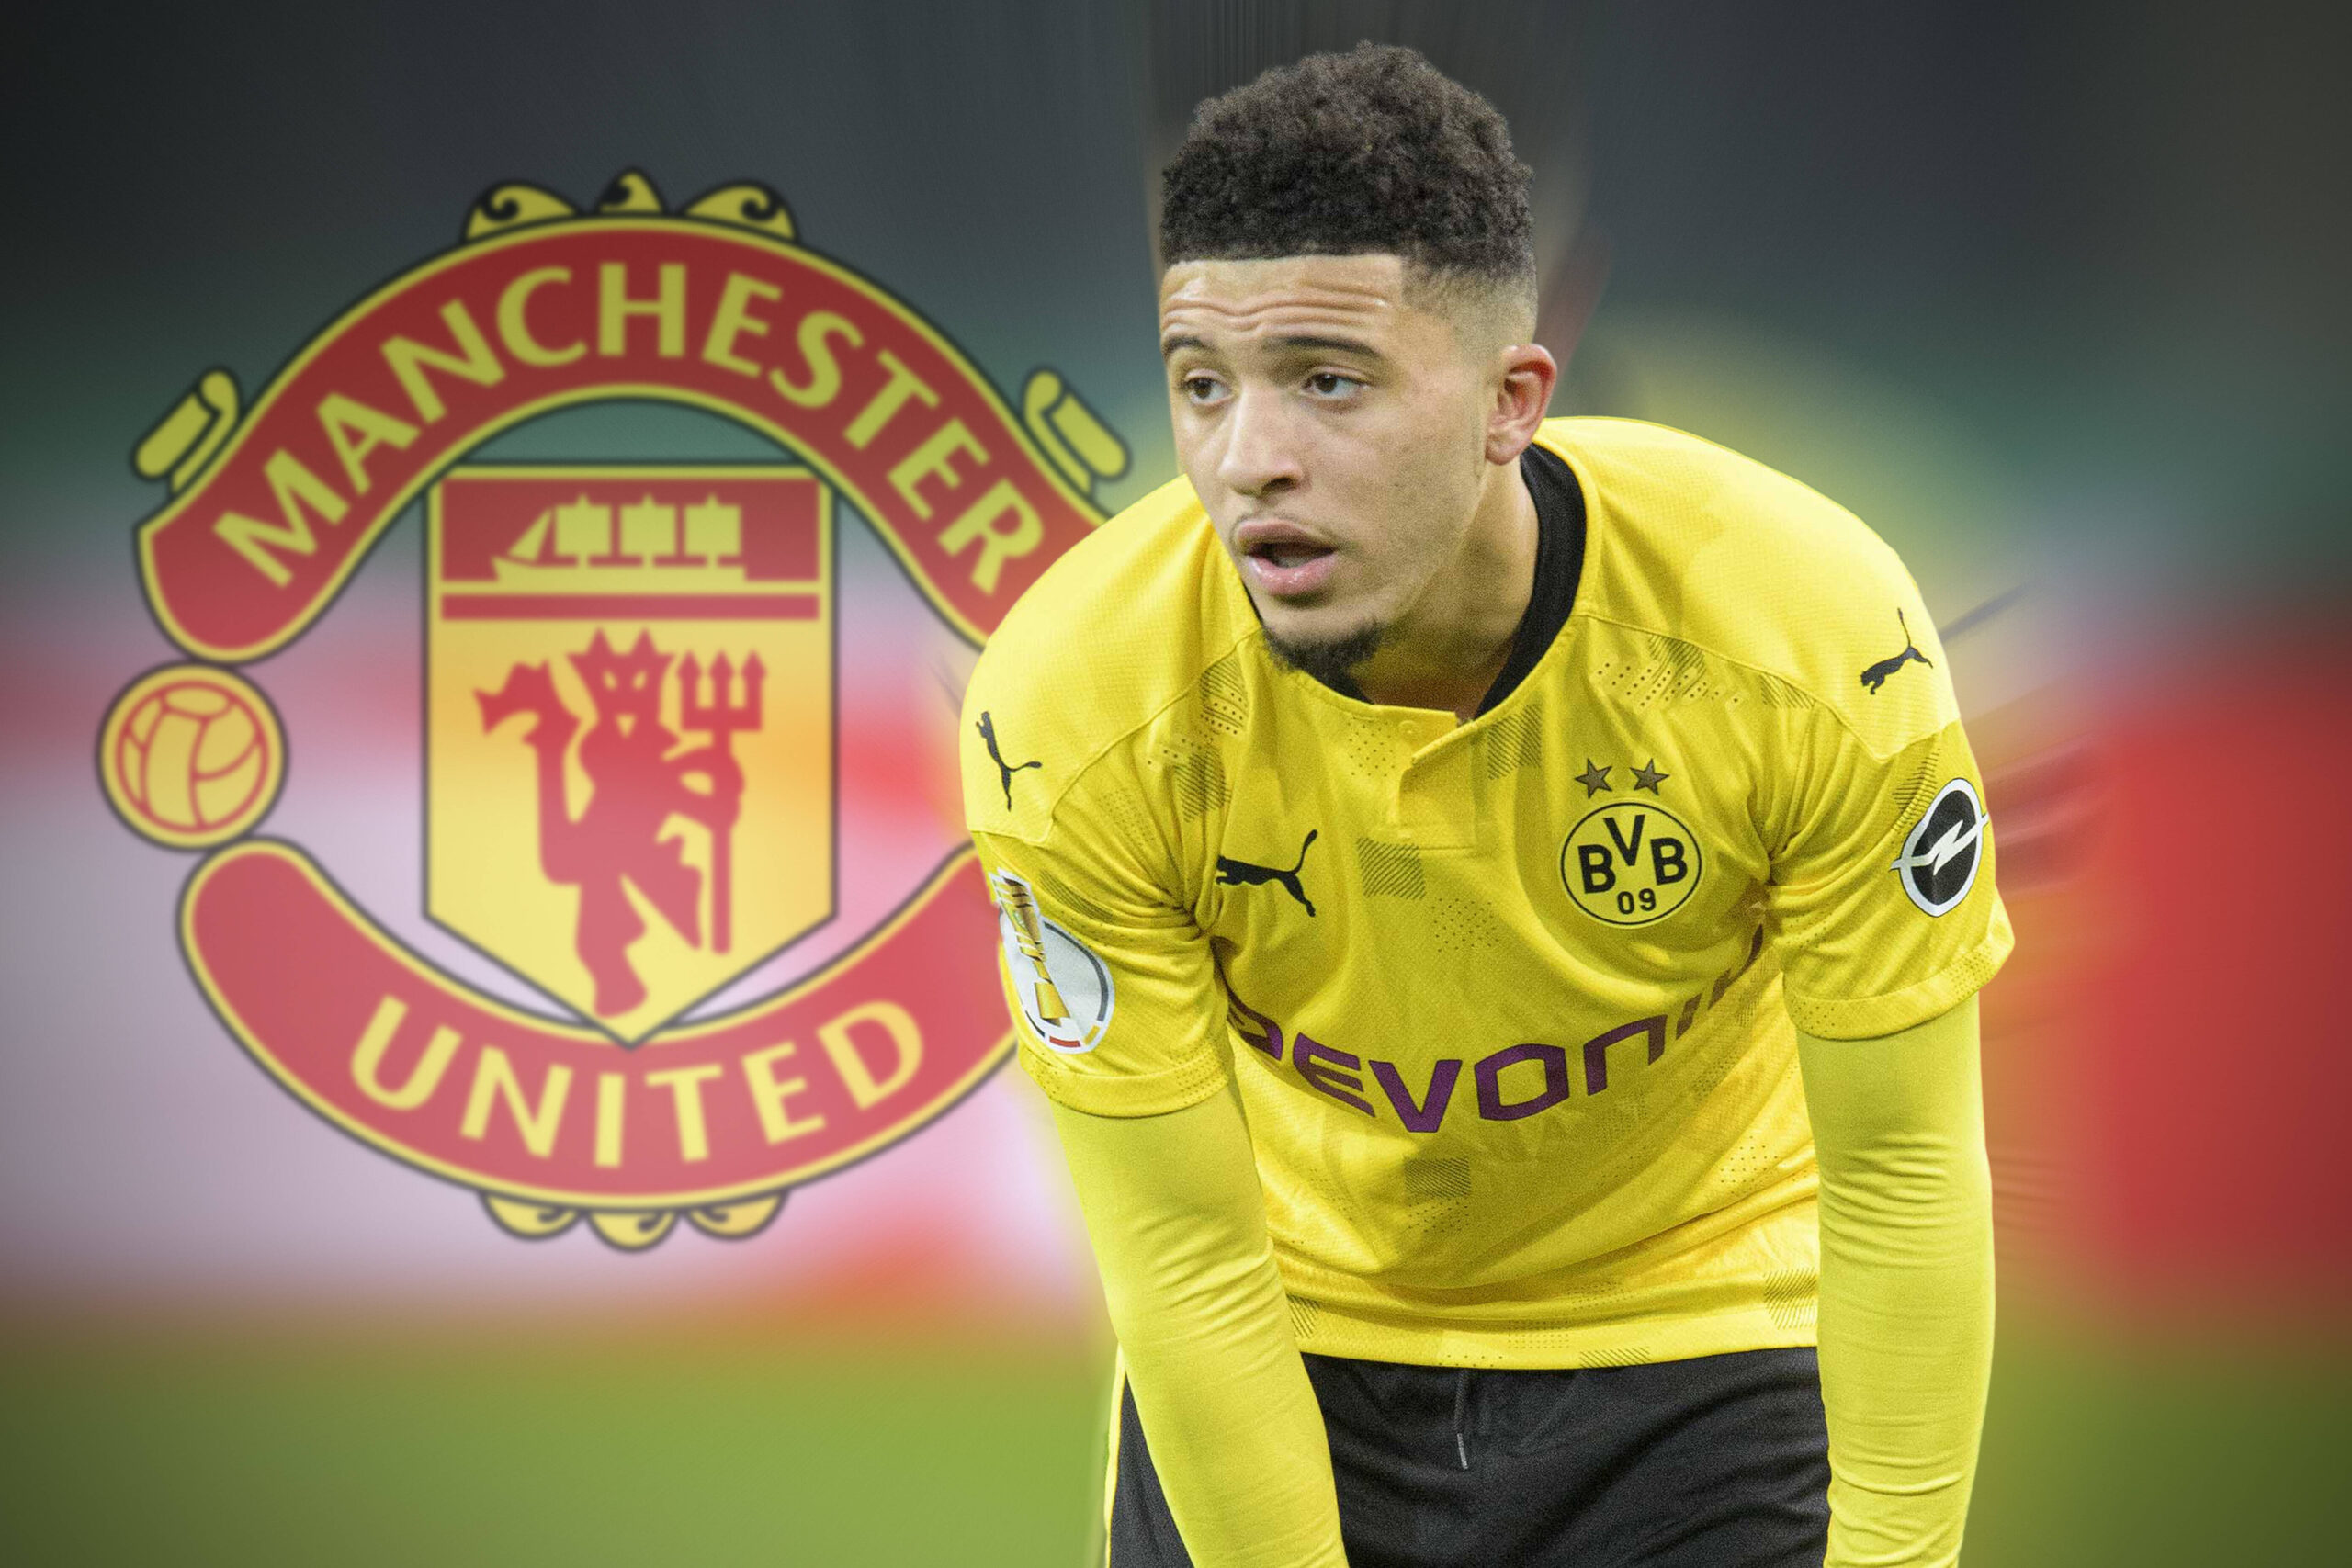 Jadon Sancho firma por el Manchester United. Firma: Imago Images